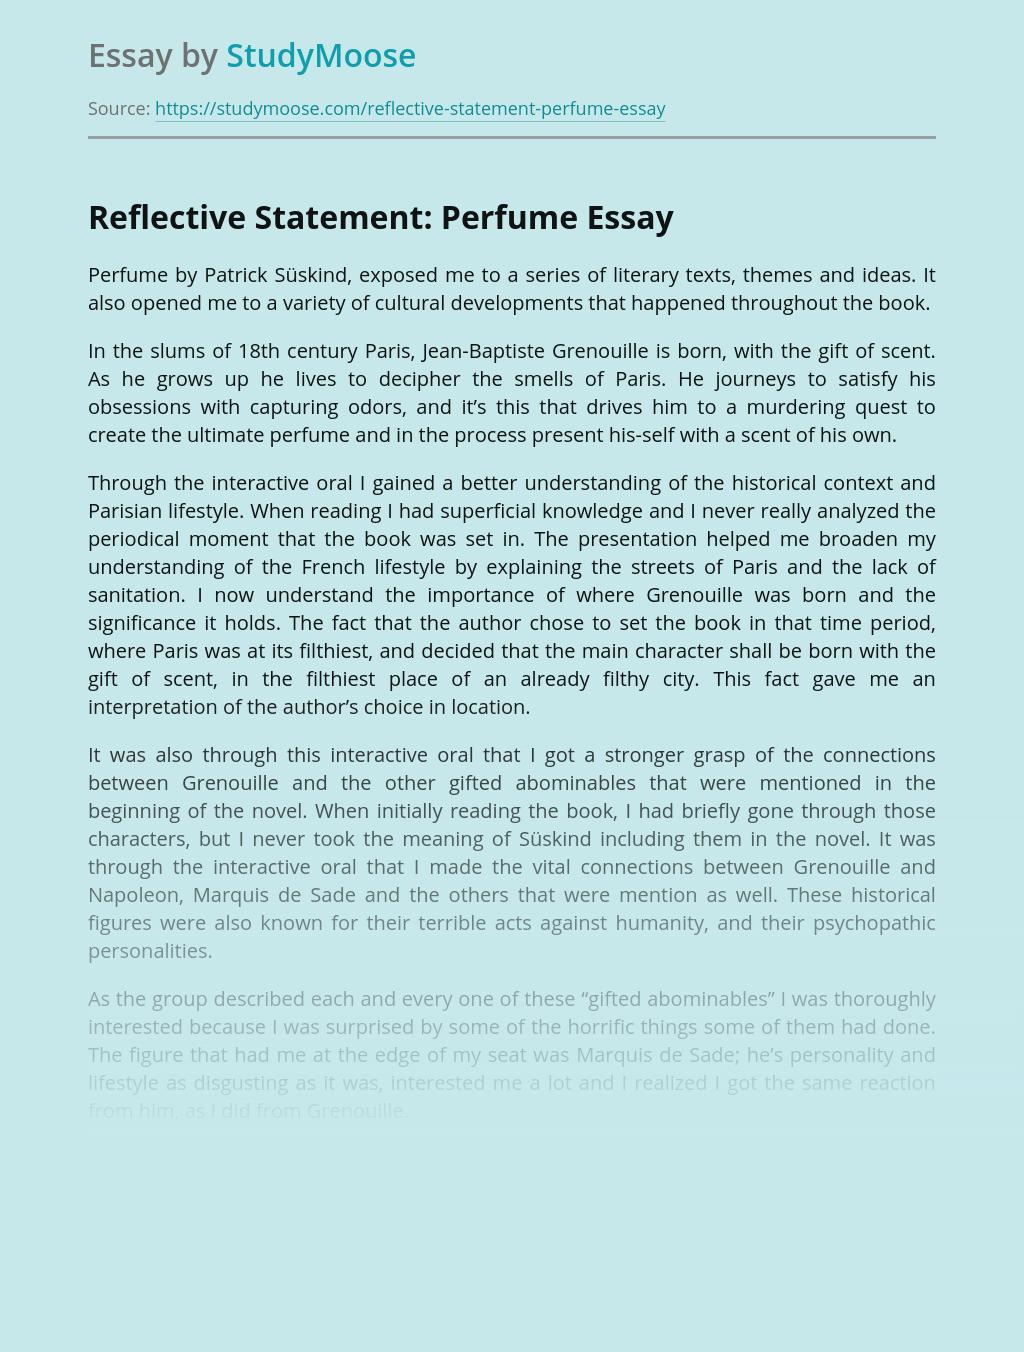 Reflective Statement: Perfume